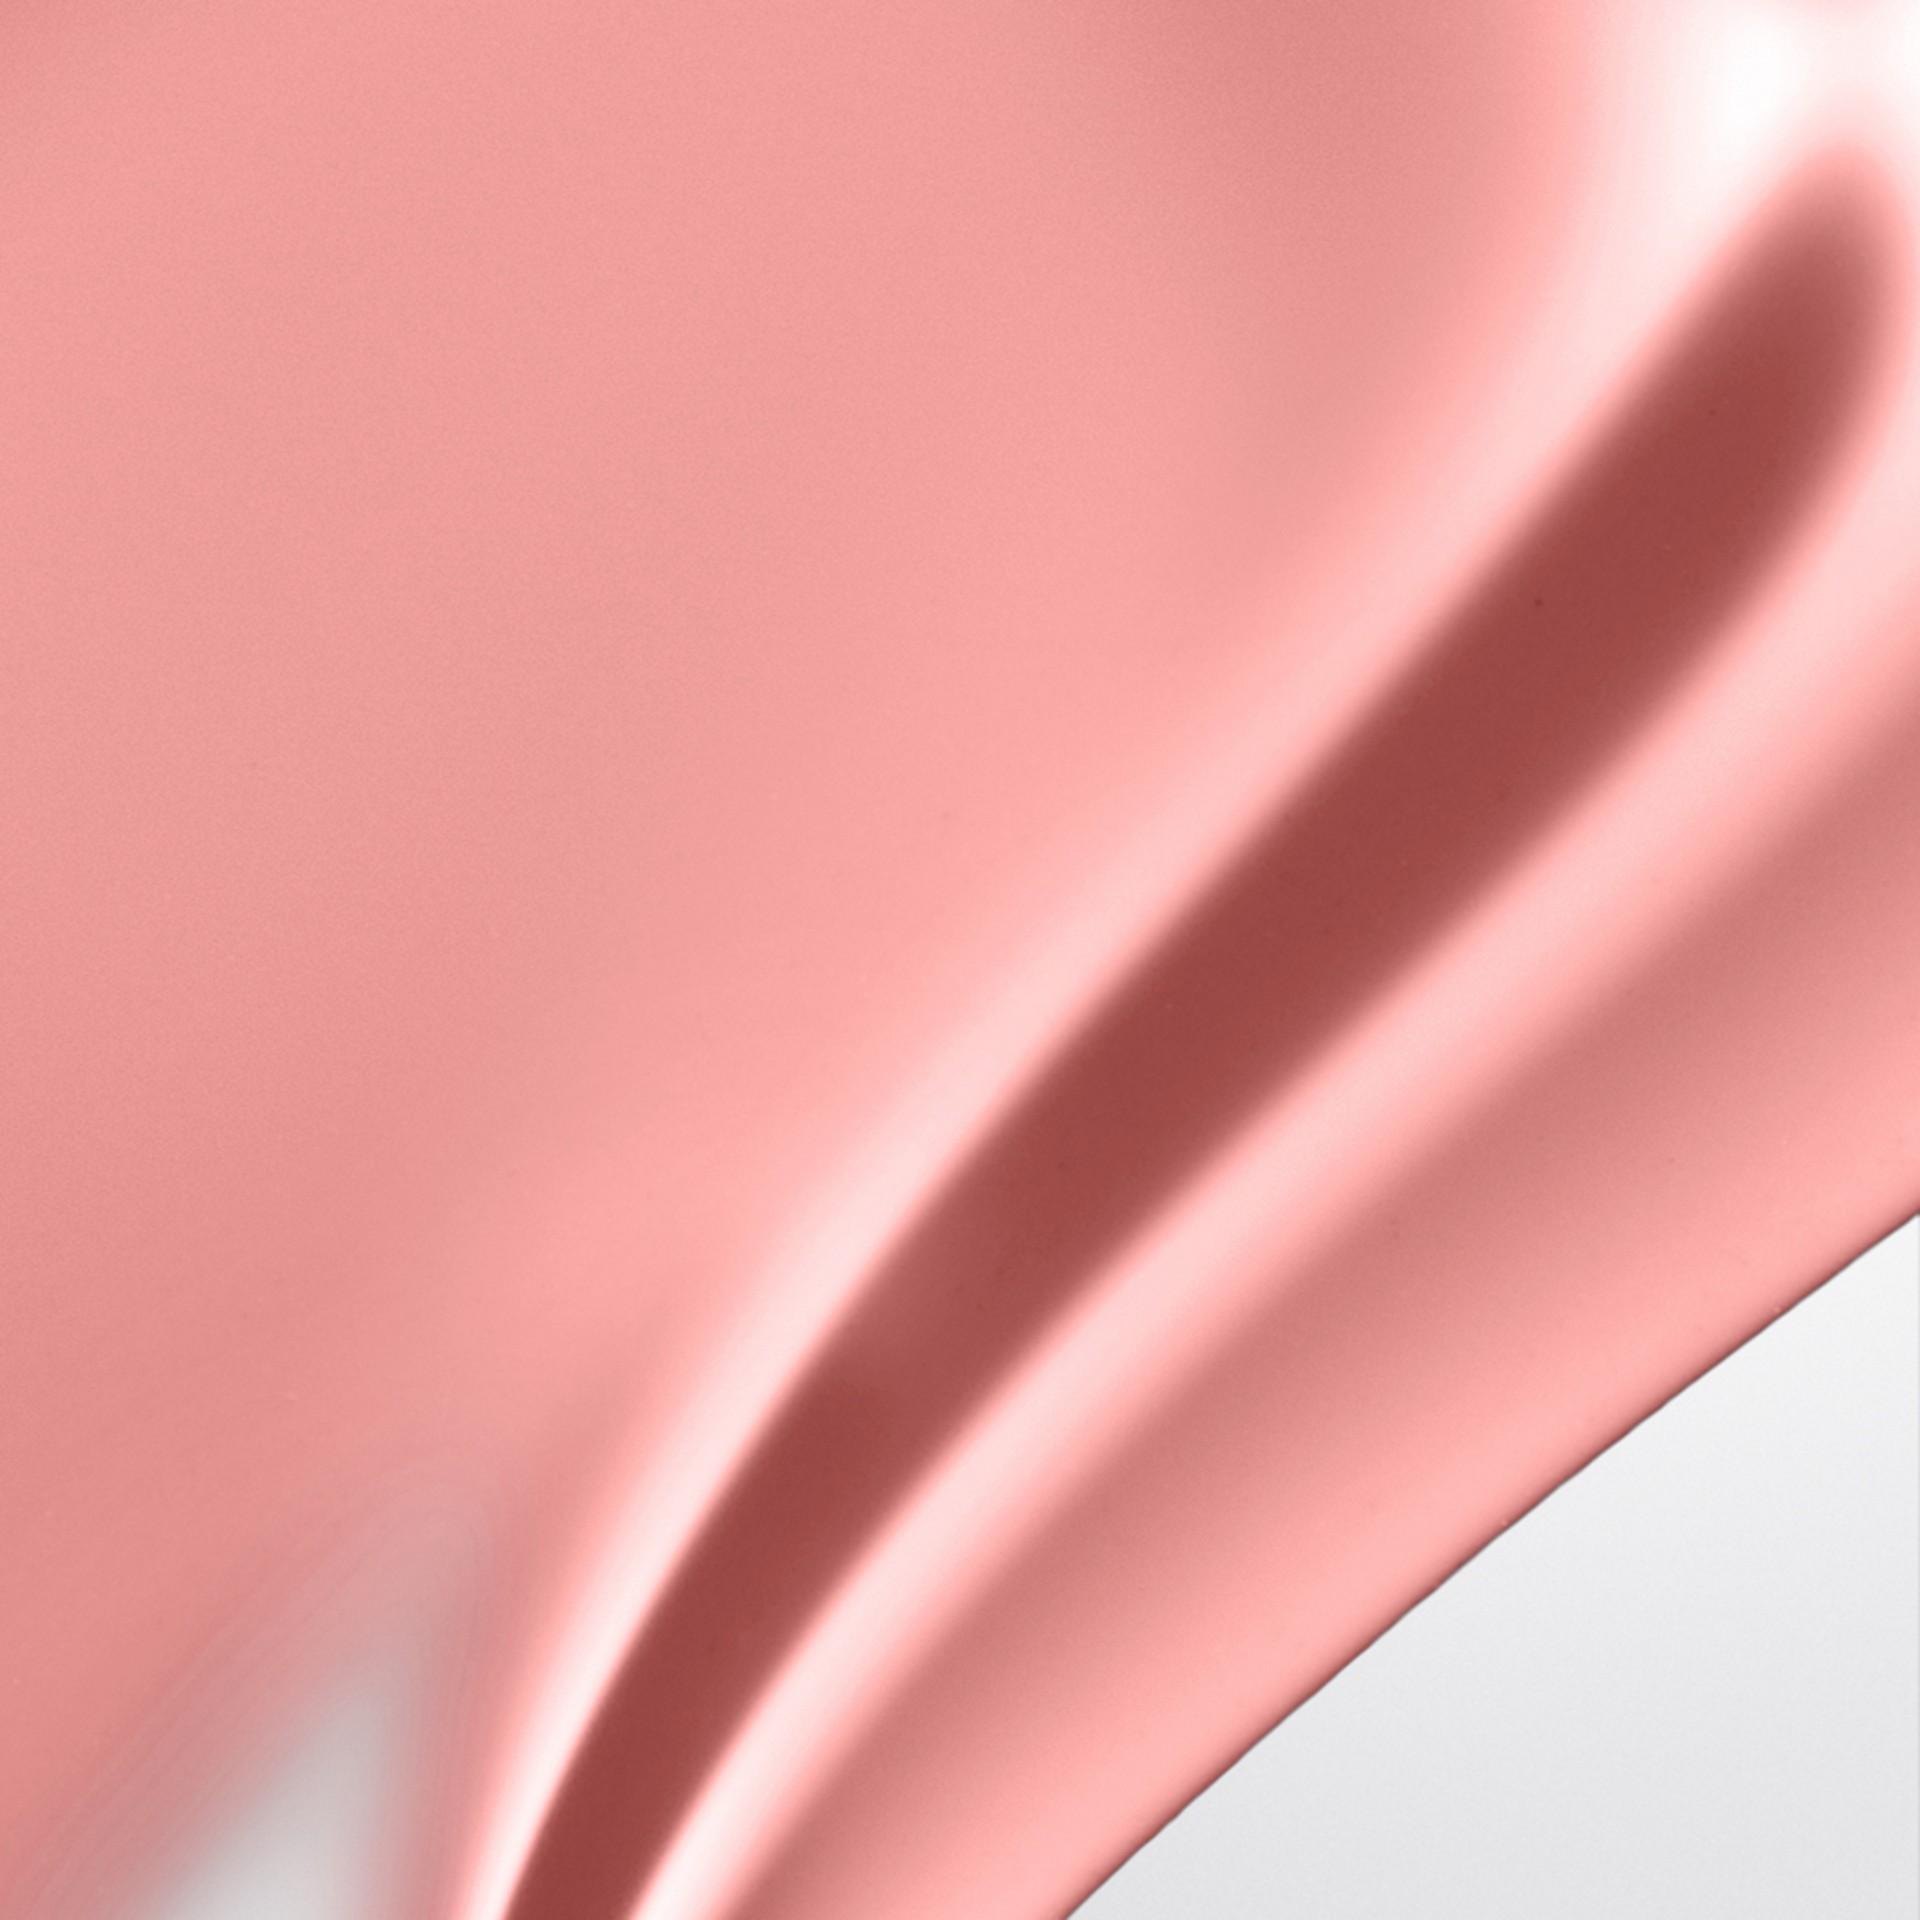 Mallow pink 19 Lip Glow - Mallow Pink No.19 - gallery image 2